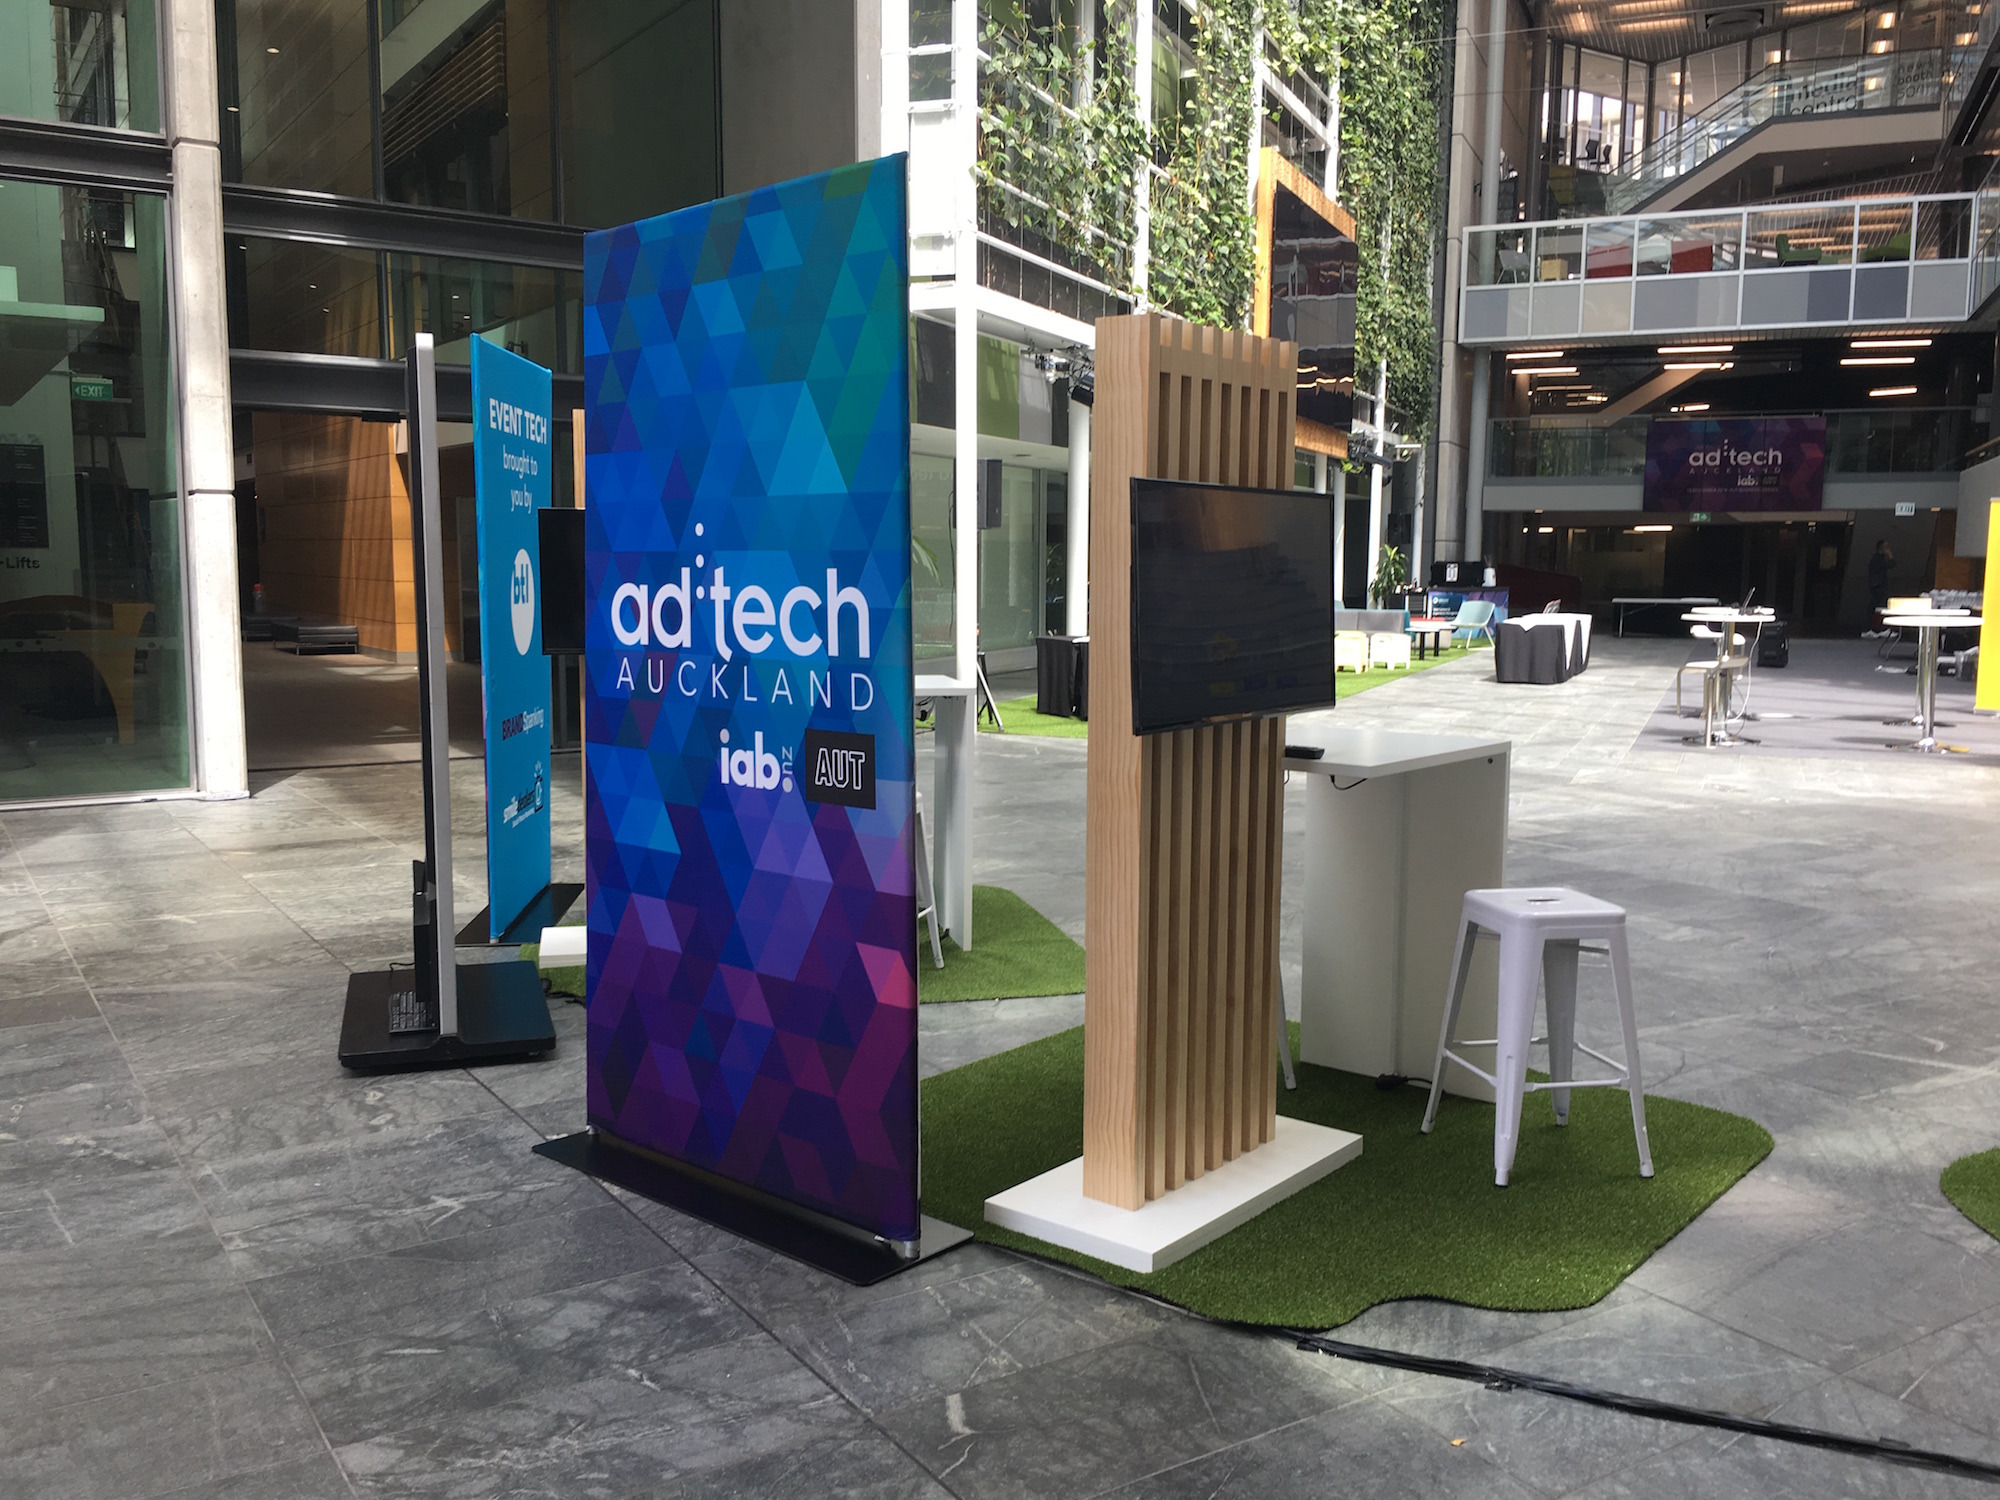 Ad Tech Auckland